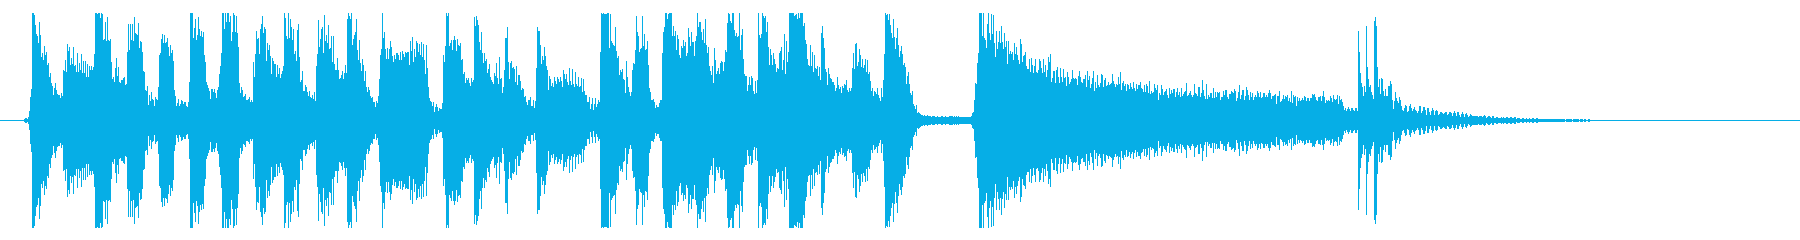 60sソウル風の明るくなれるジングル☆の再生済みの波形